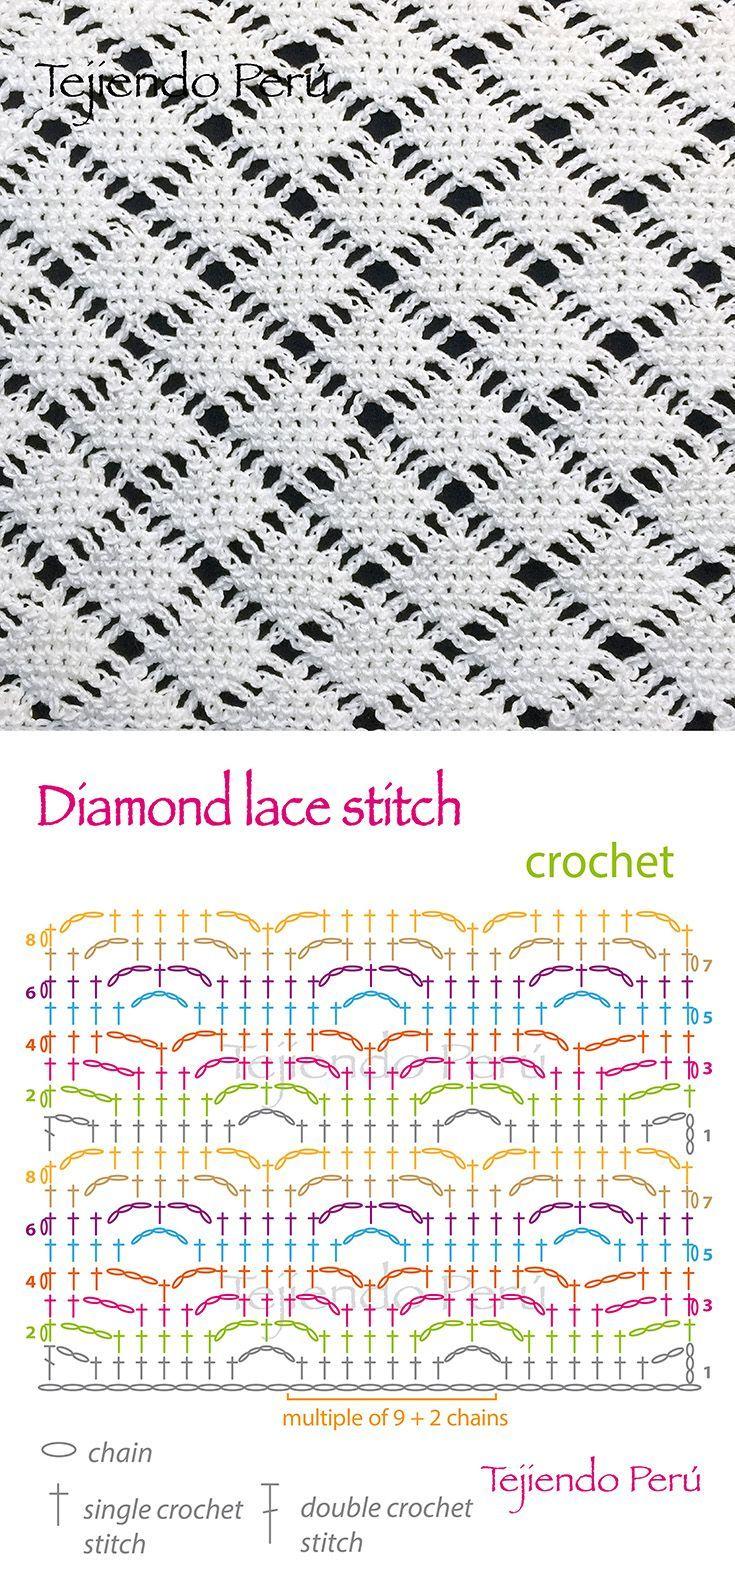 Crochet Diamond Lace Stitch Diagram Crochet Puntos Y